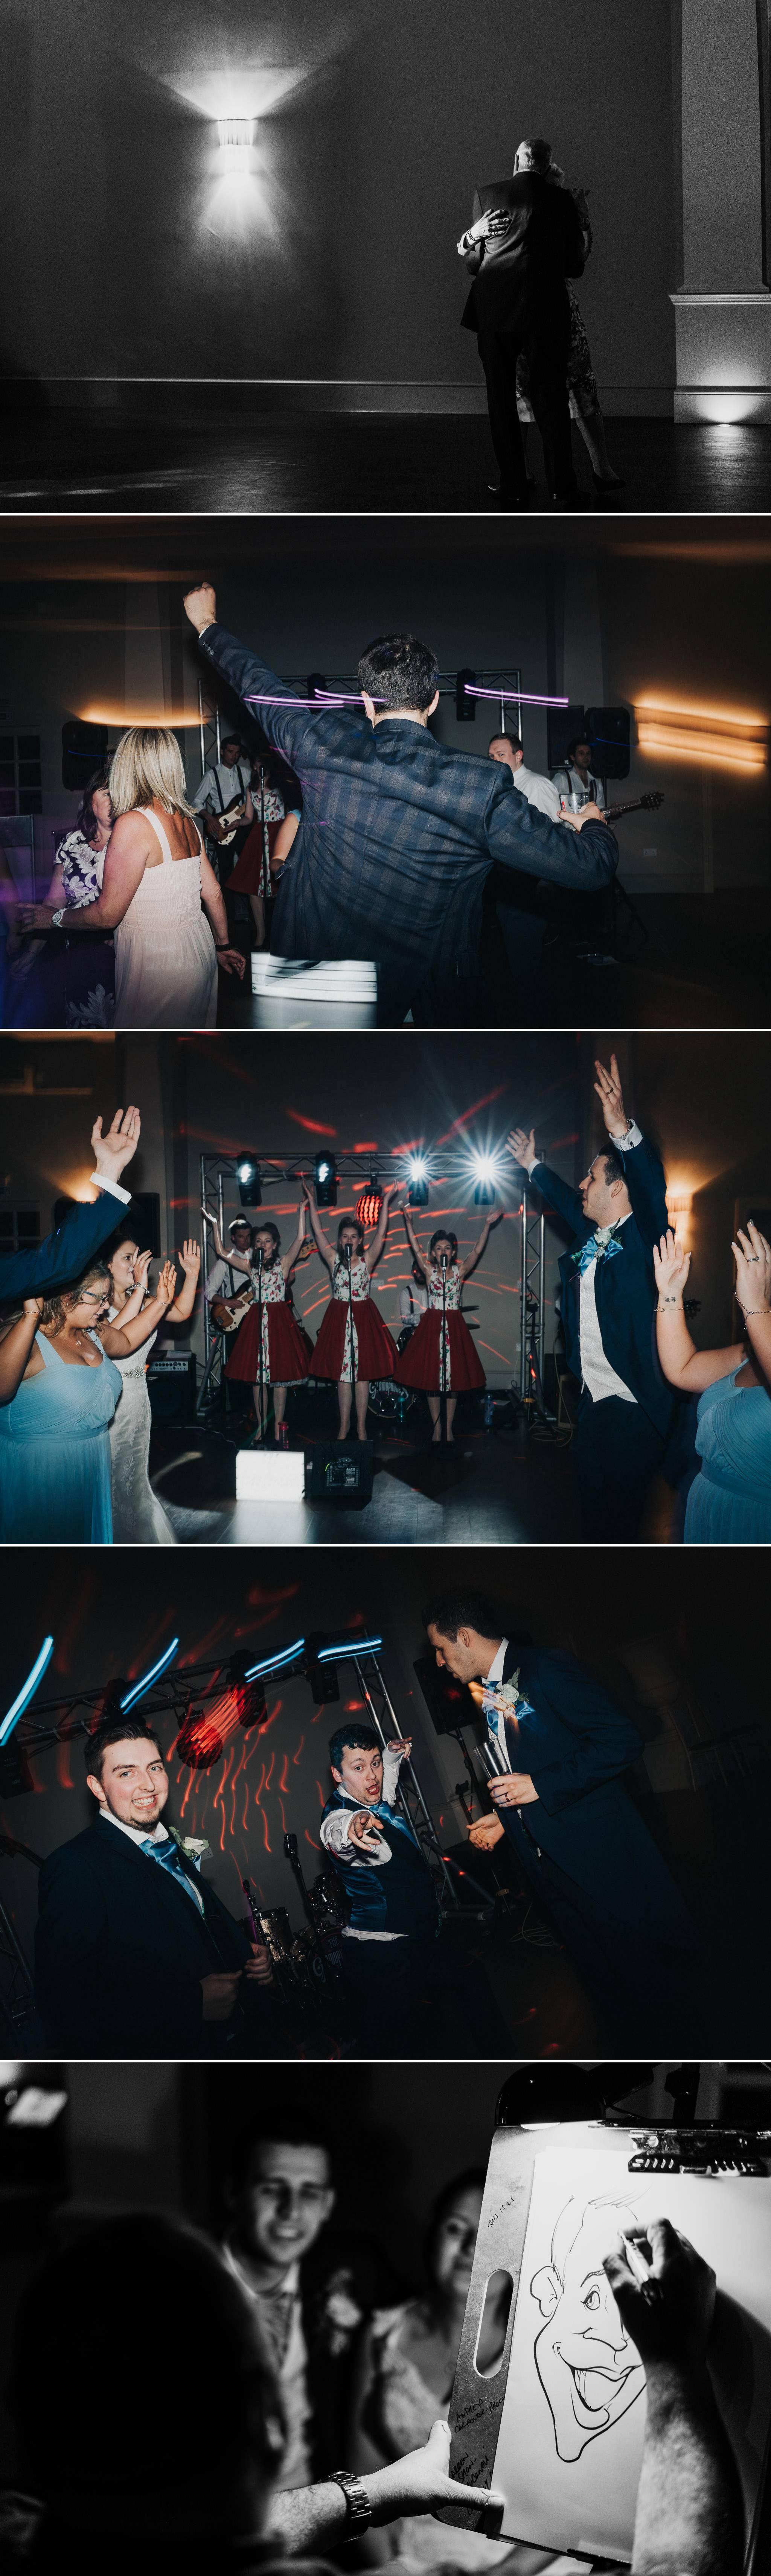 stubton-hall-wedding-photography 24.jpg